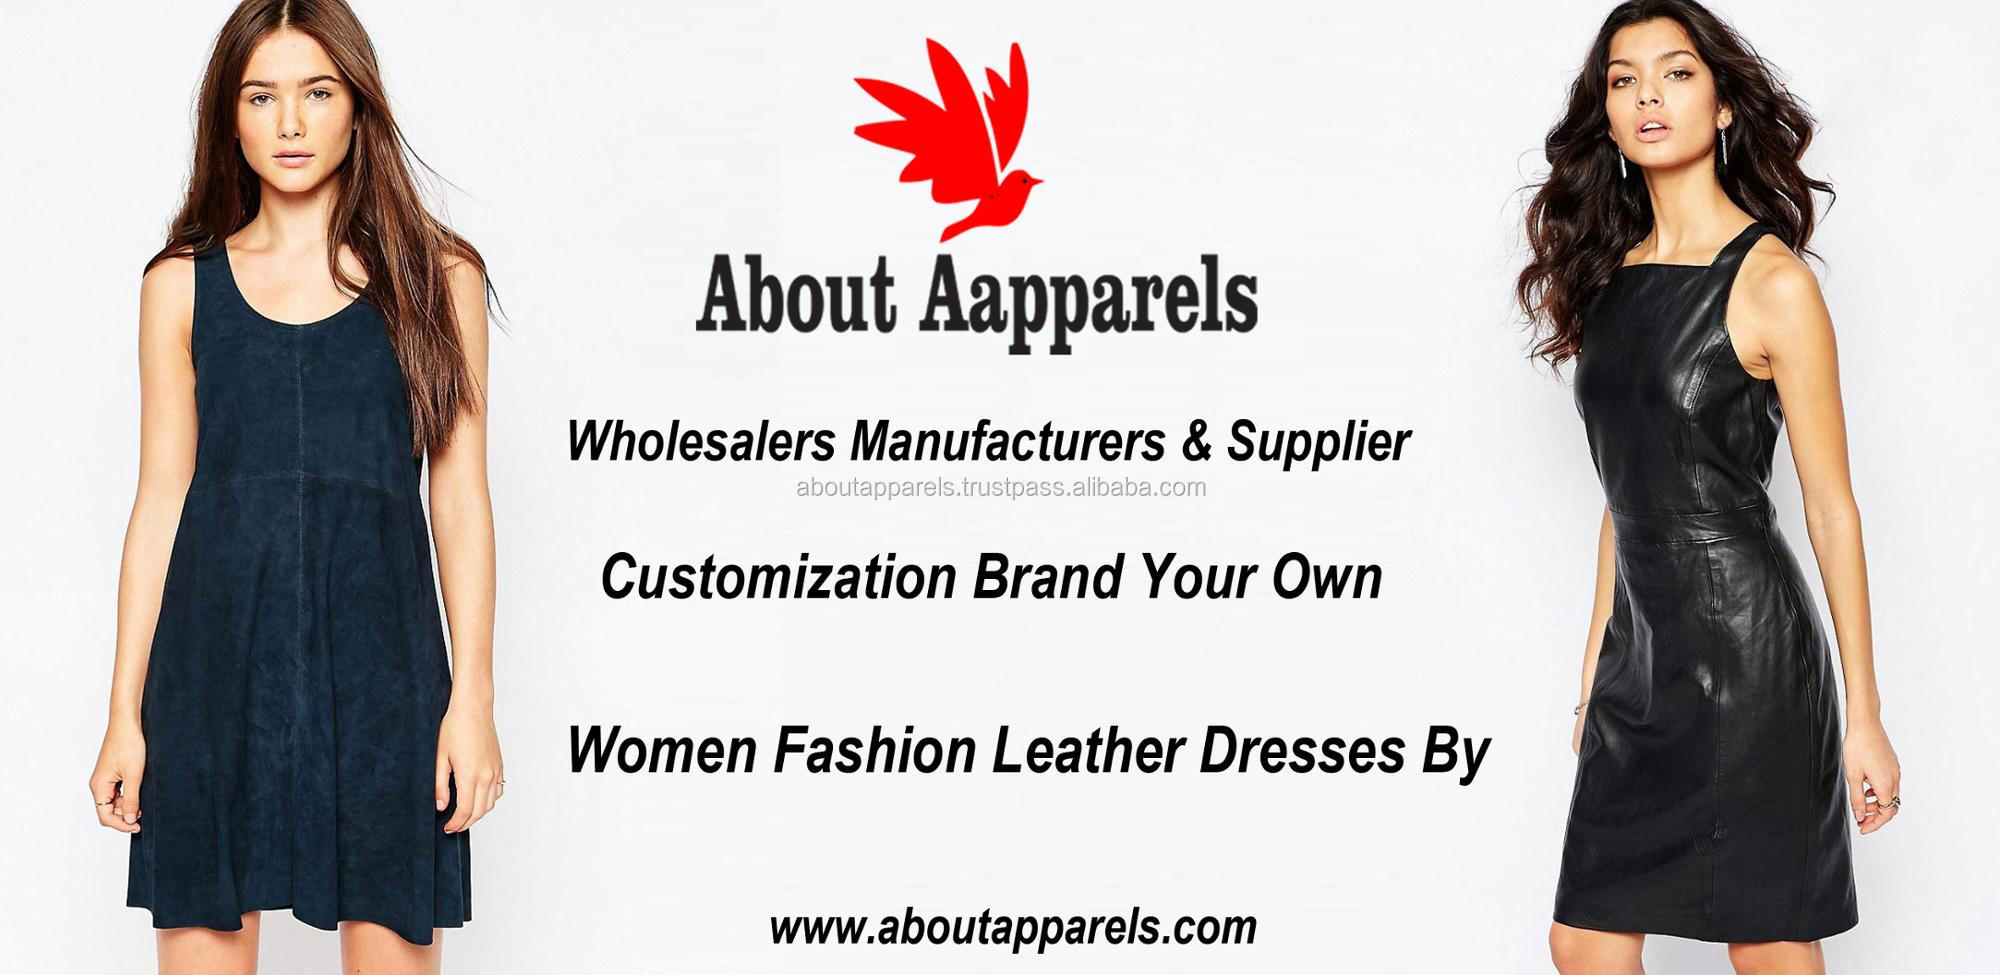 2017 new ladies dress summer Sleeveless Peach Skin Tassel Dress wholesale clothing sexy Casual,New Cheap Women Fashionable,